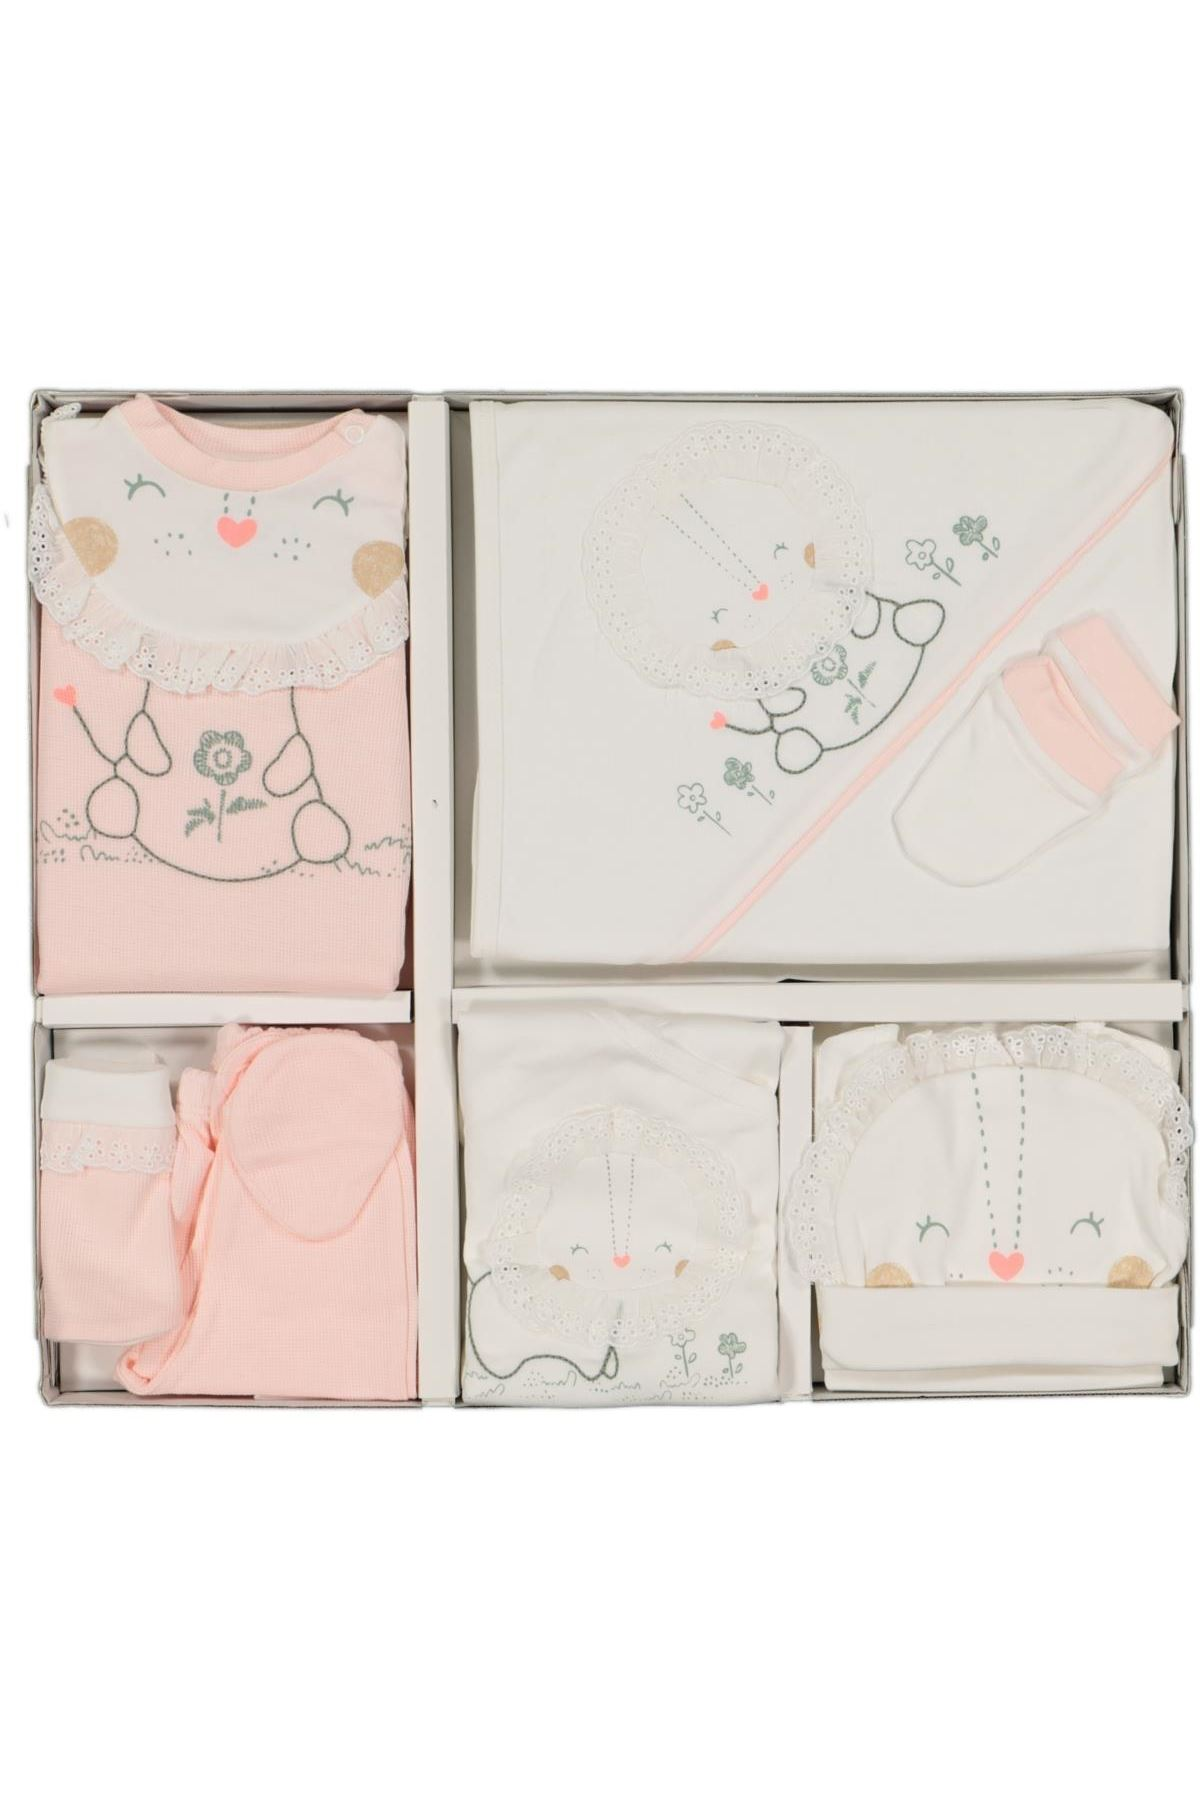 Tongs Baby Cute Baby Lion Tulumlu 10 Parça Zıbın Seti 3304 Pembe